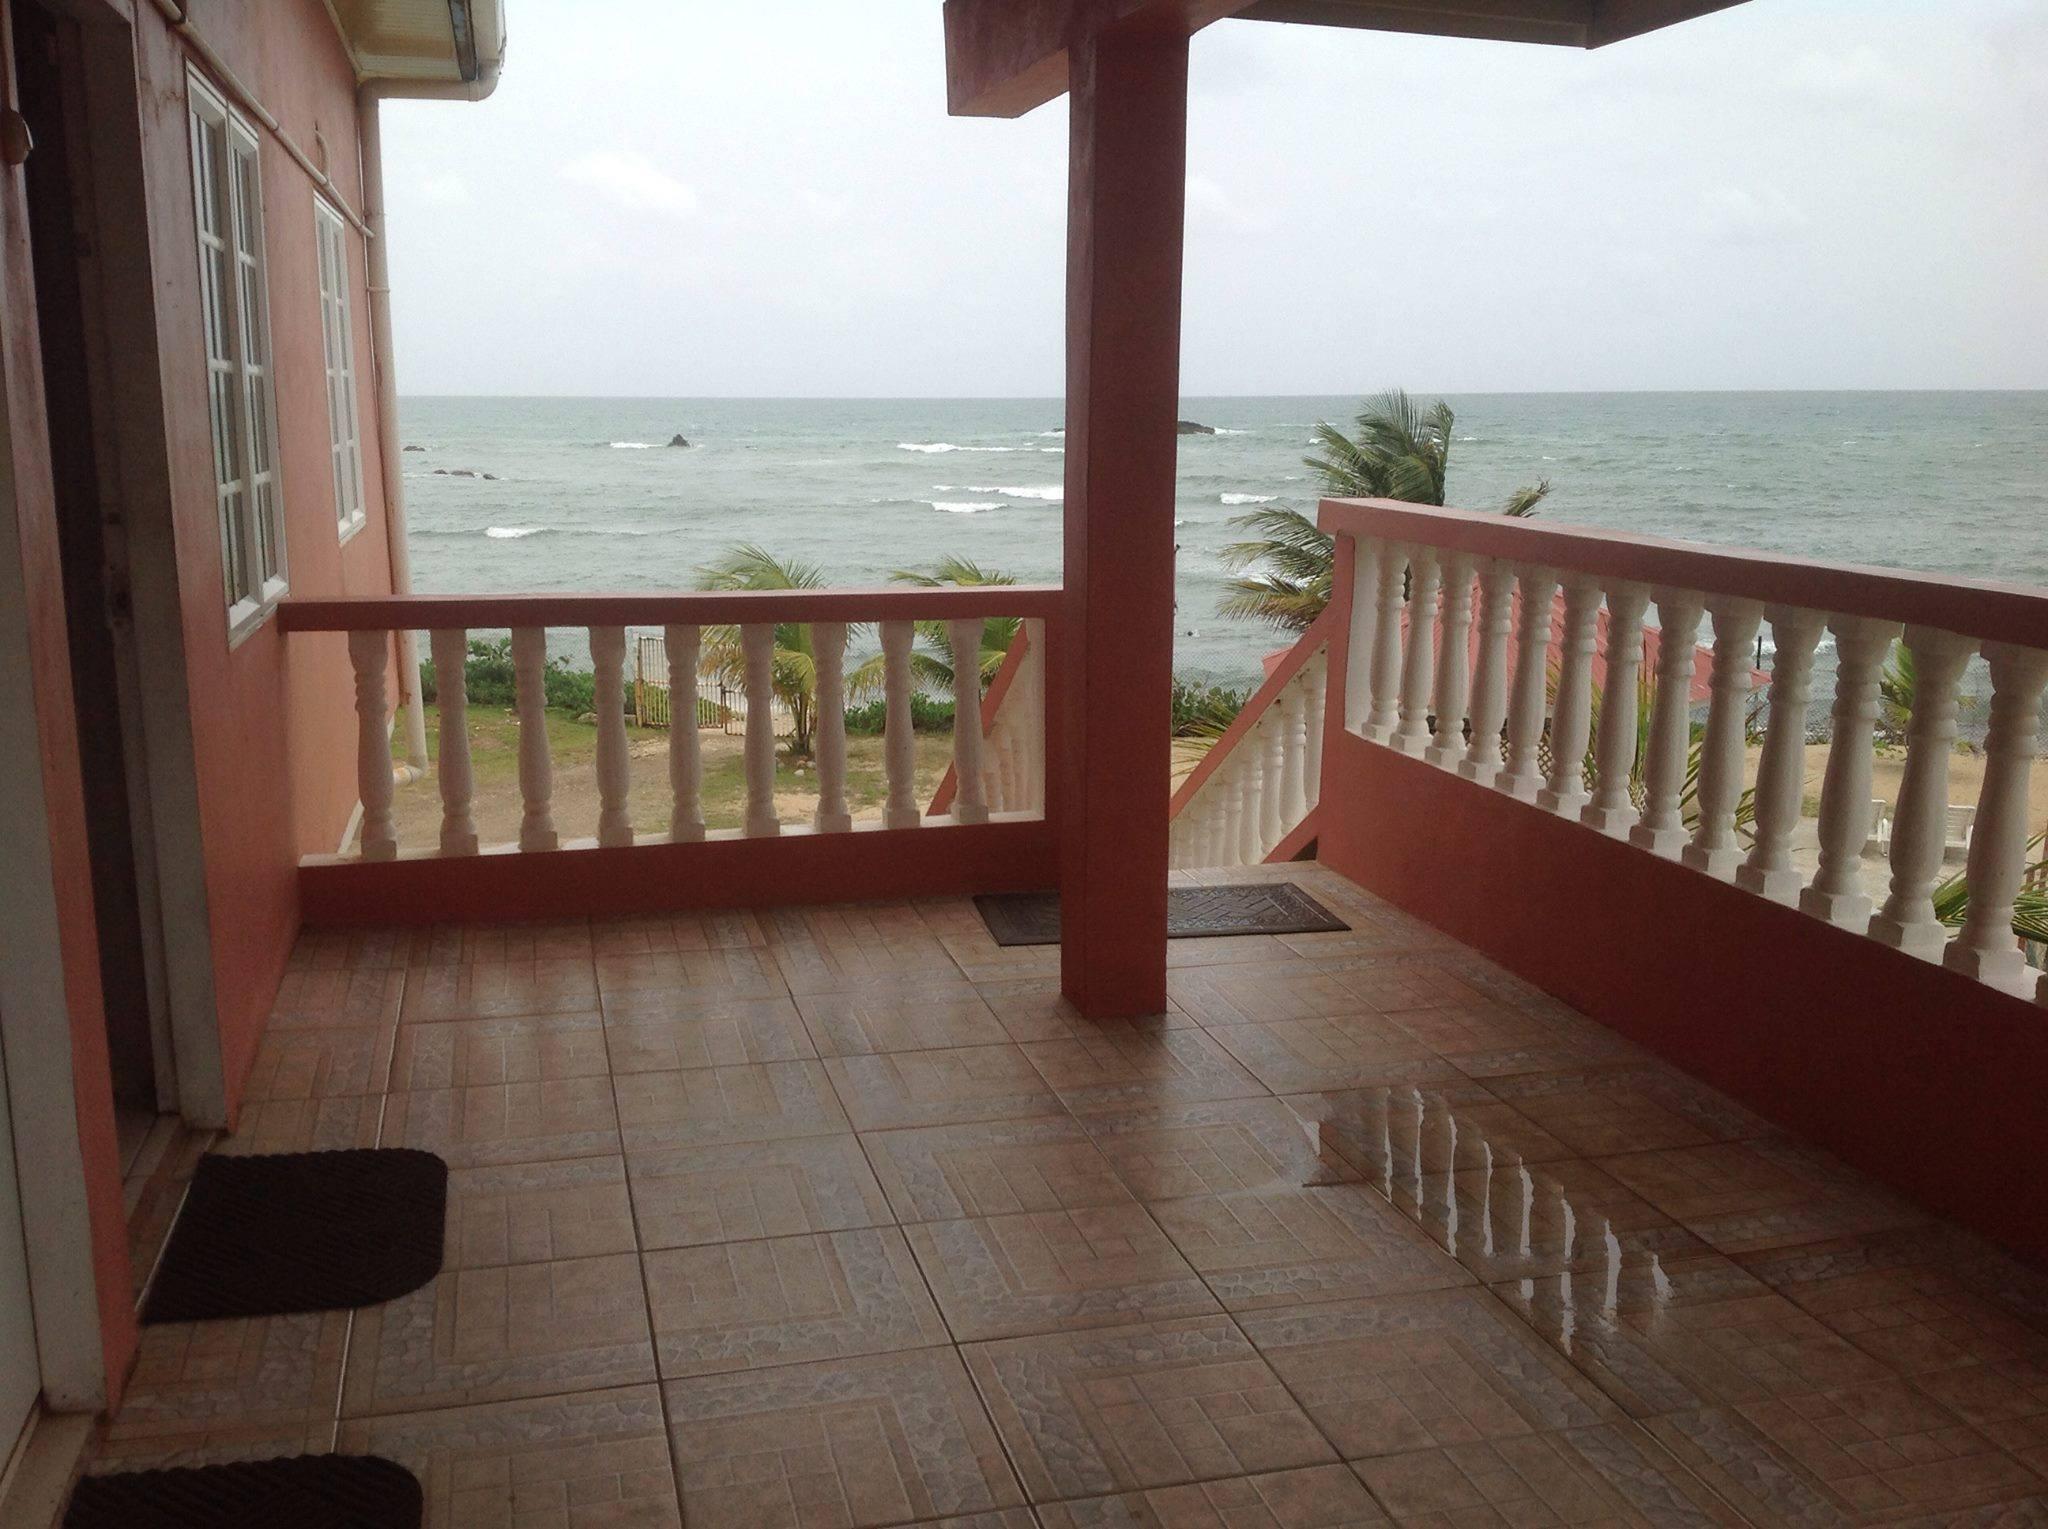 Fantastic Thomas On The Beach 2 Bedroom Units Trinidad Tobago Home Interior And Landscaping Mentranervesignezvosmurscom